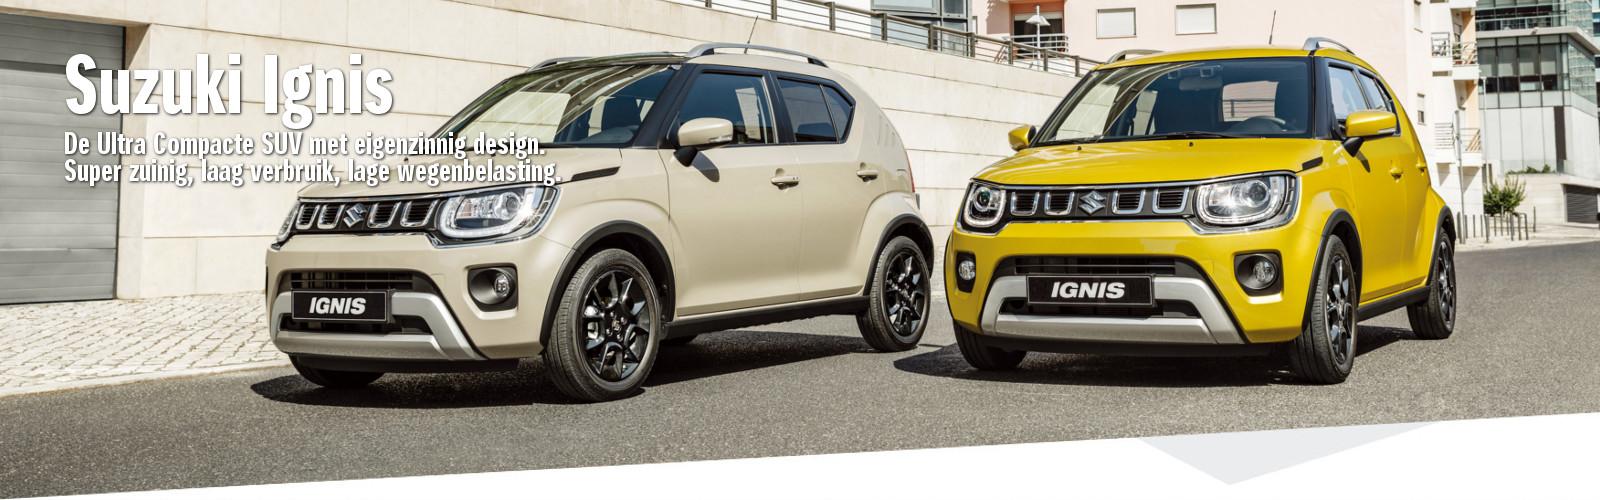 Mengelers Suzuki - Suzuki Ignis model 2020